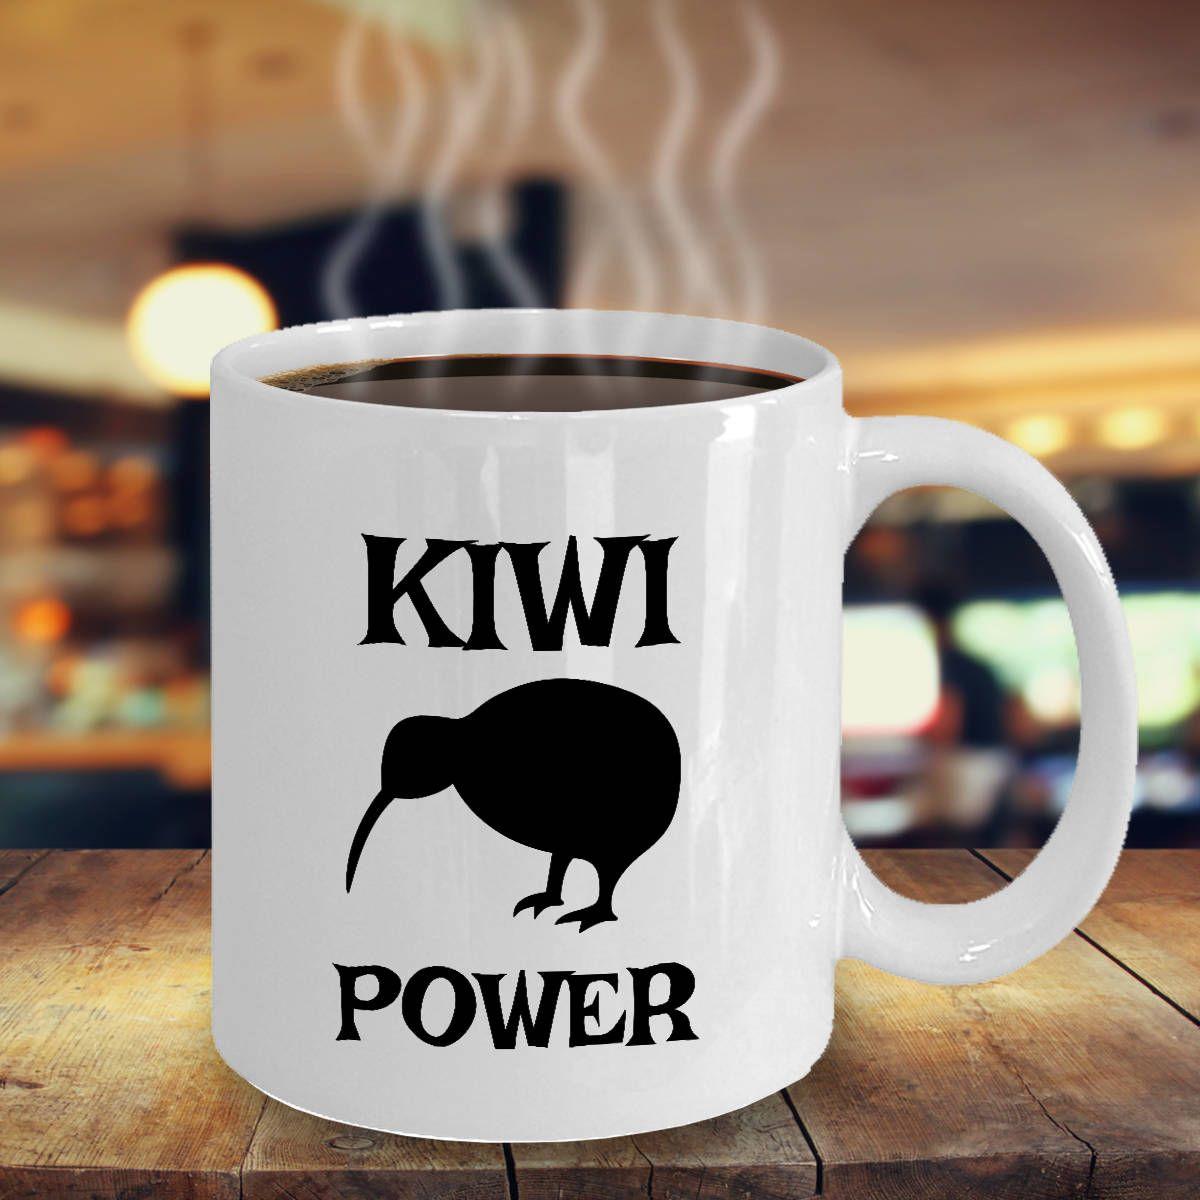 Kiwi Bird Mug Cute Kiwi Power Bird Coffee, Tea Cup Gift